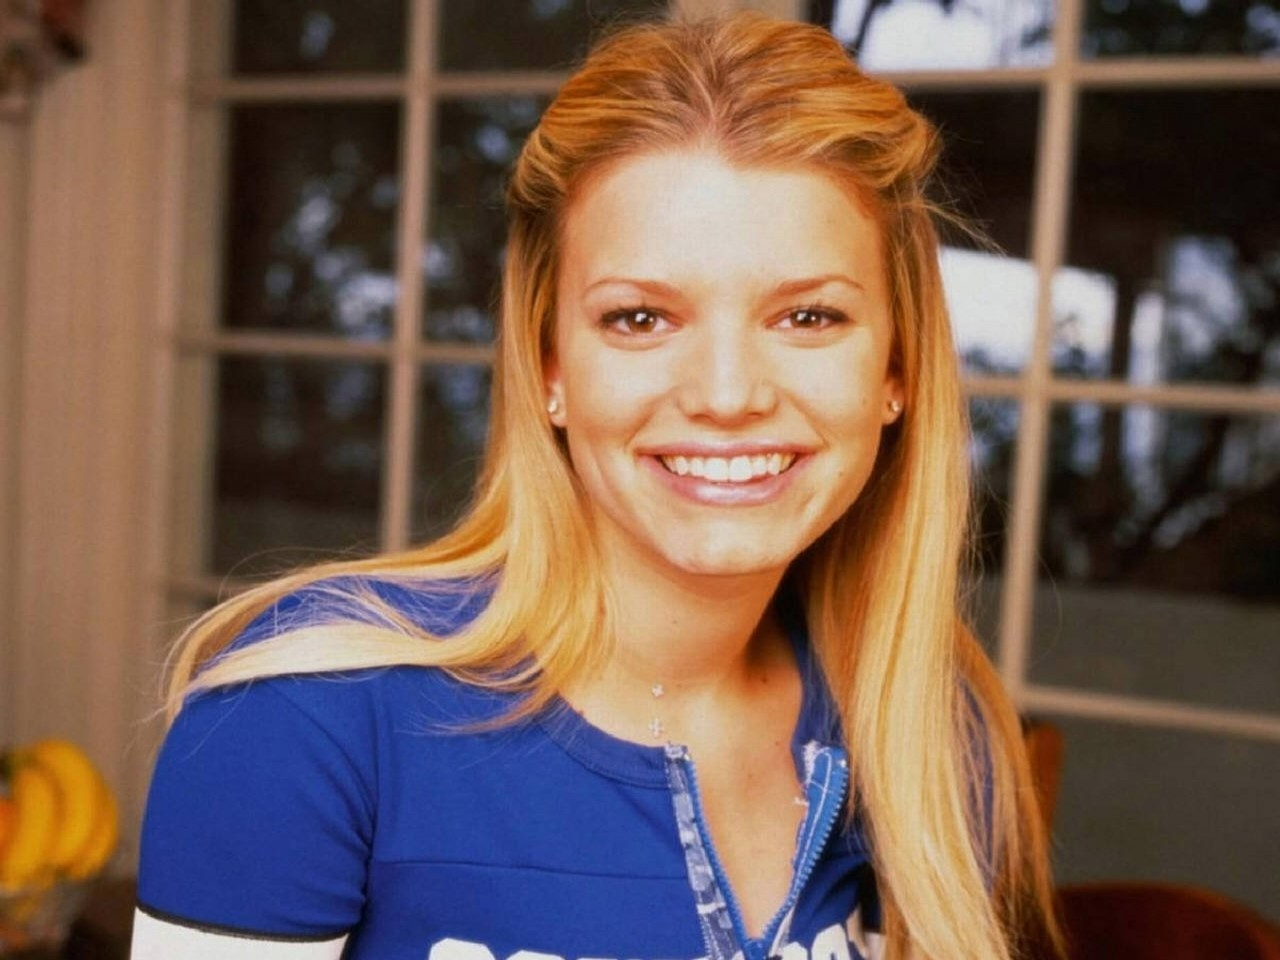 Wallpaper di Jessica Simpson in t-shirt blu